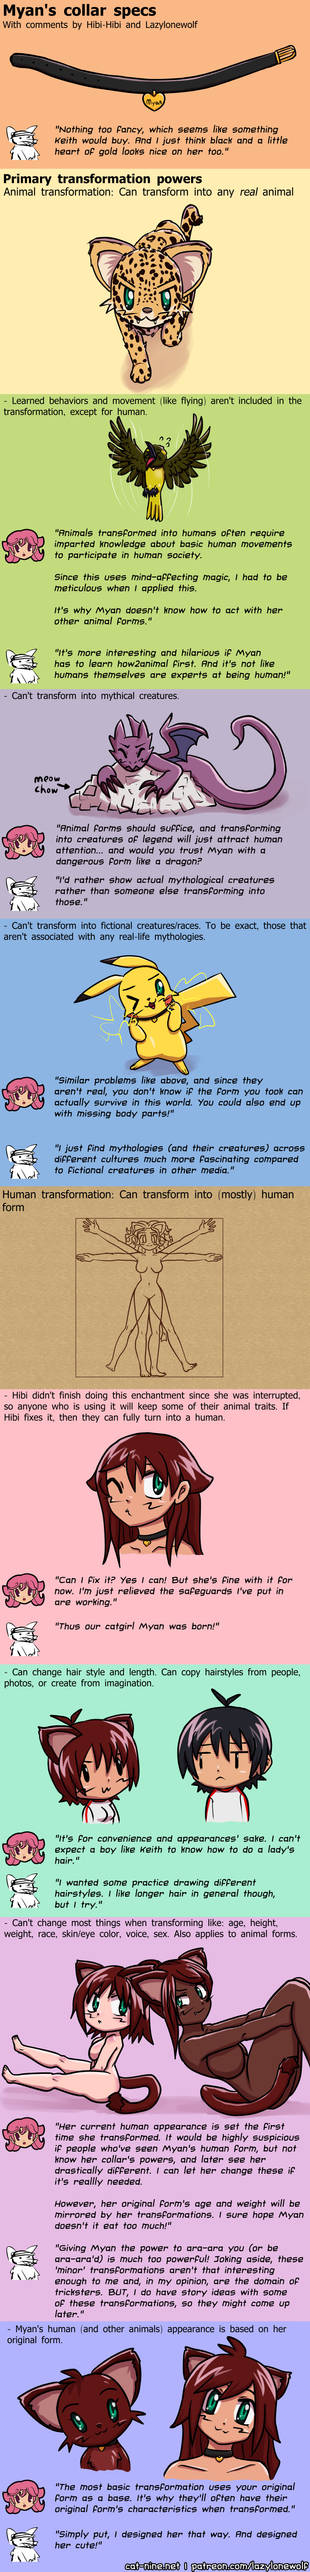 Collar specs 1/3: Primary transformation powers